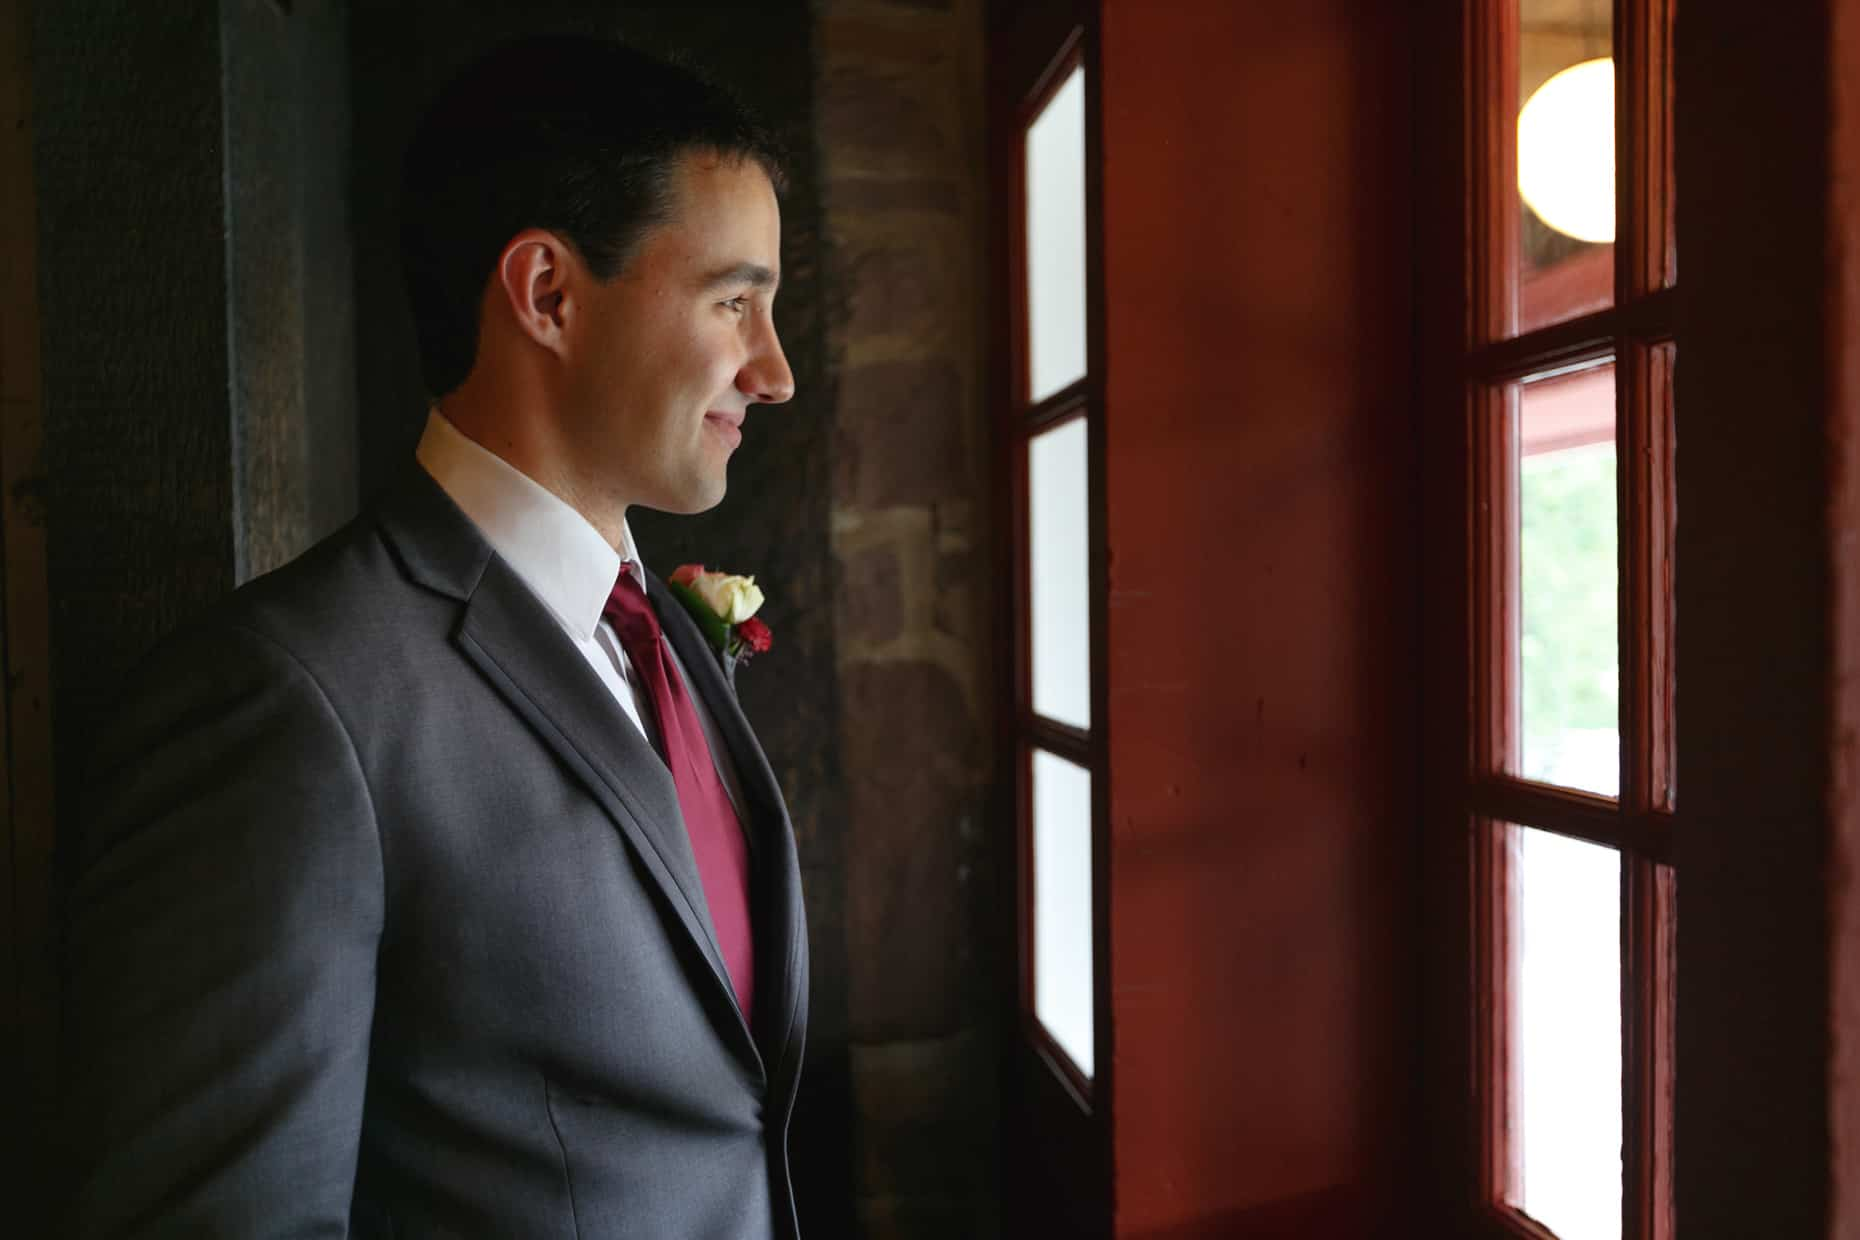 Robert Ryan weddings